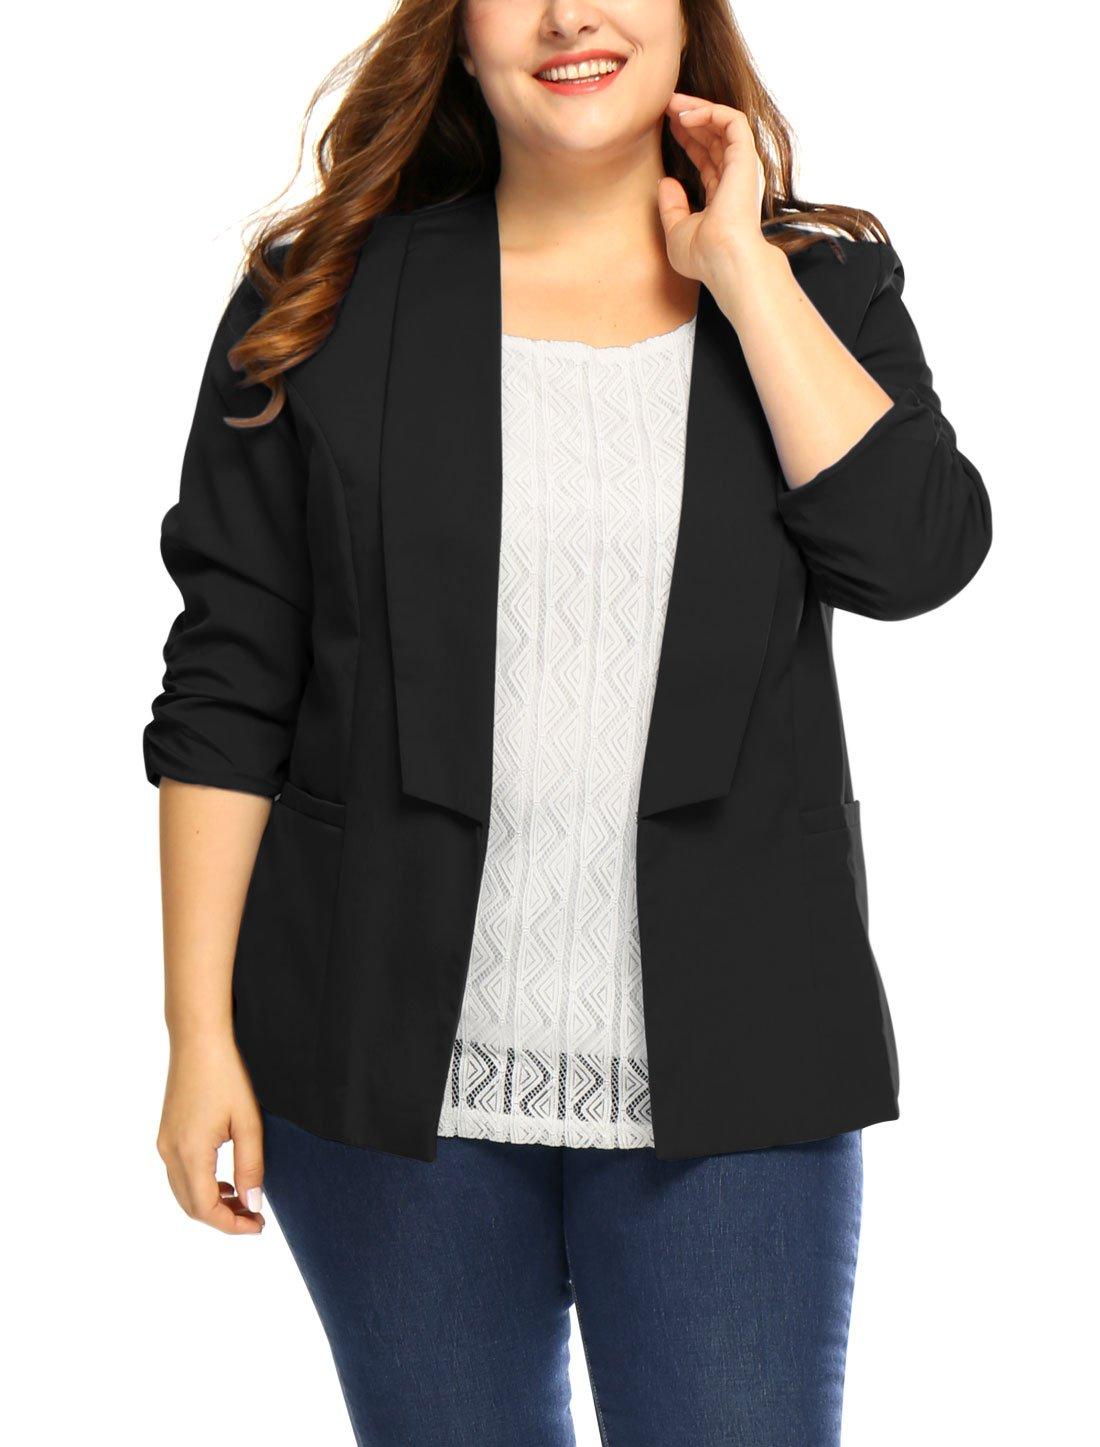 uxcell Women's Plus Size 3/4 Sleeves Turn Down Collar Blazer 1X Black